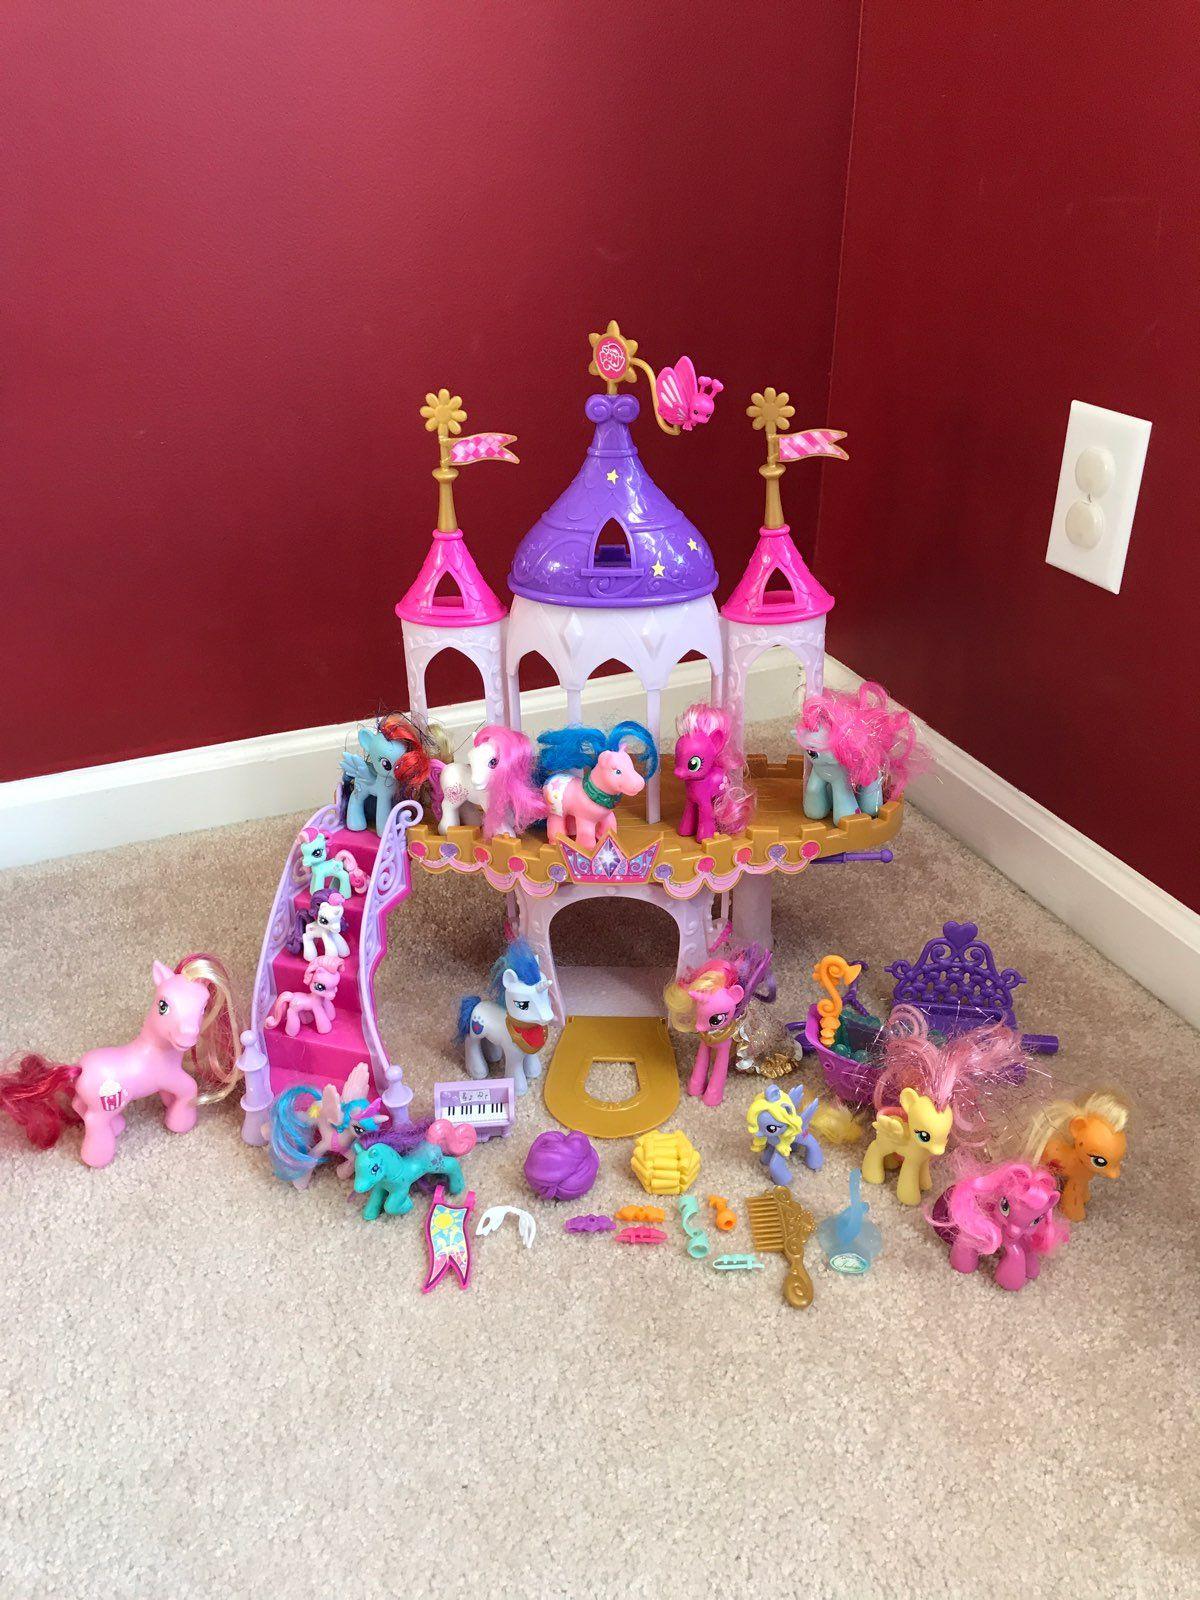 My Little Pony Wedding Castle Playset Mercari Castle Wedding Playset My Little Pony